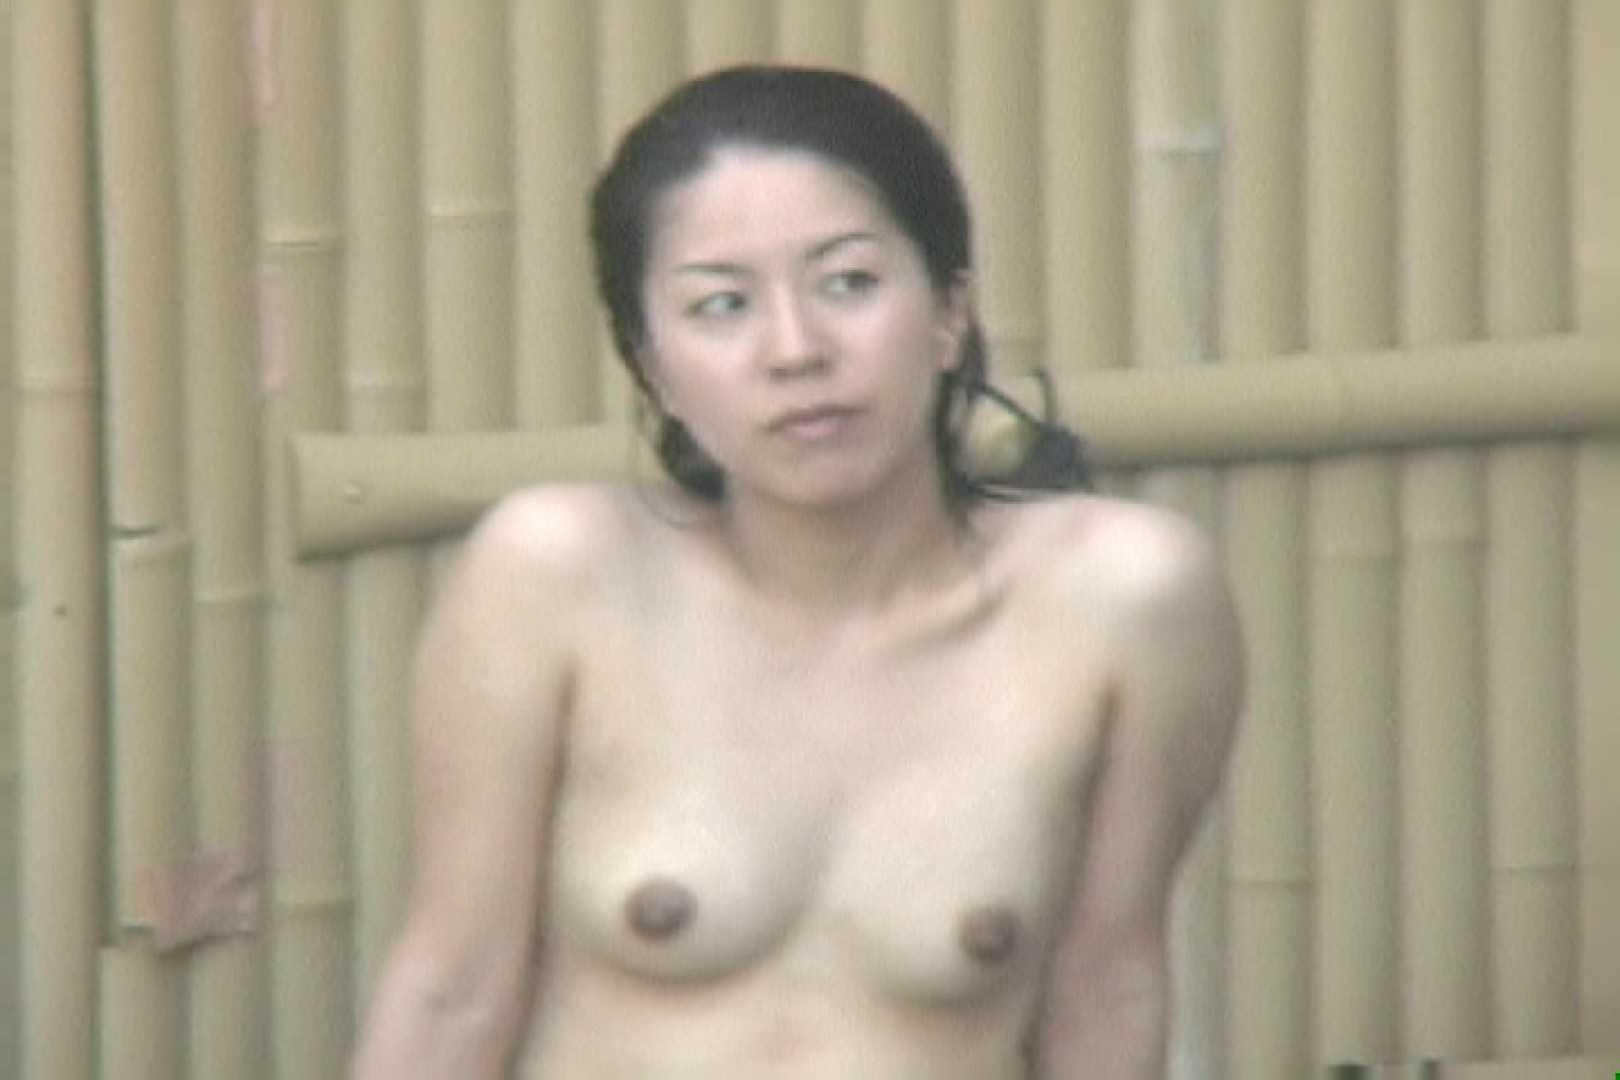 Aquaな露天風呂Vol.694 露天 | OLセックス  67画像 46